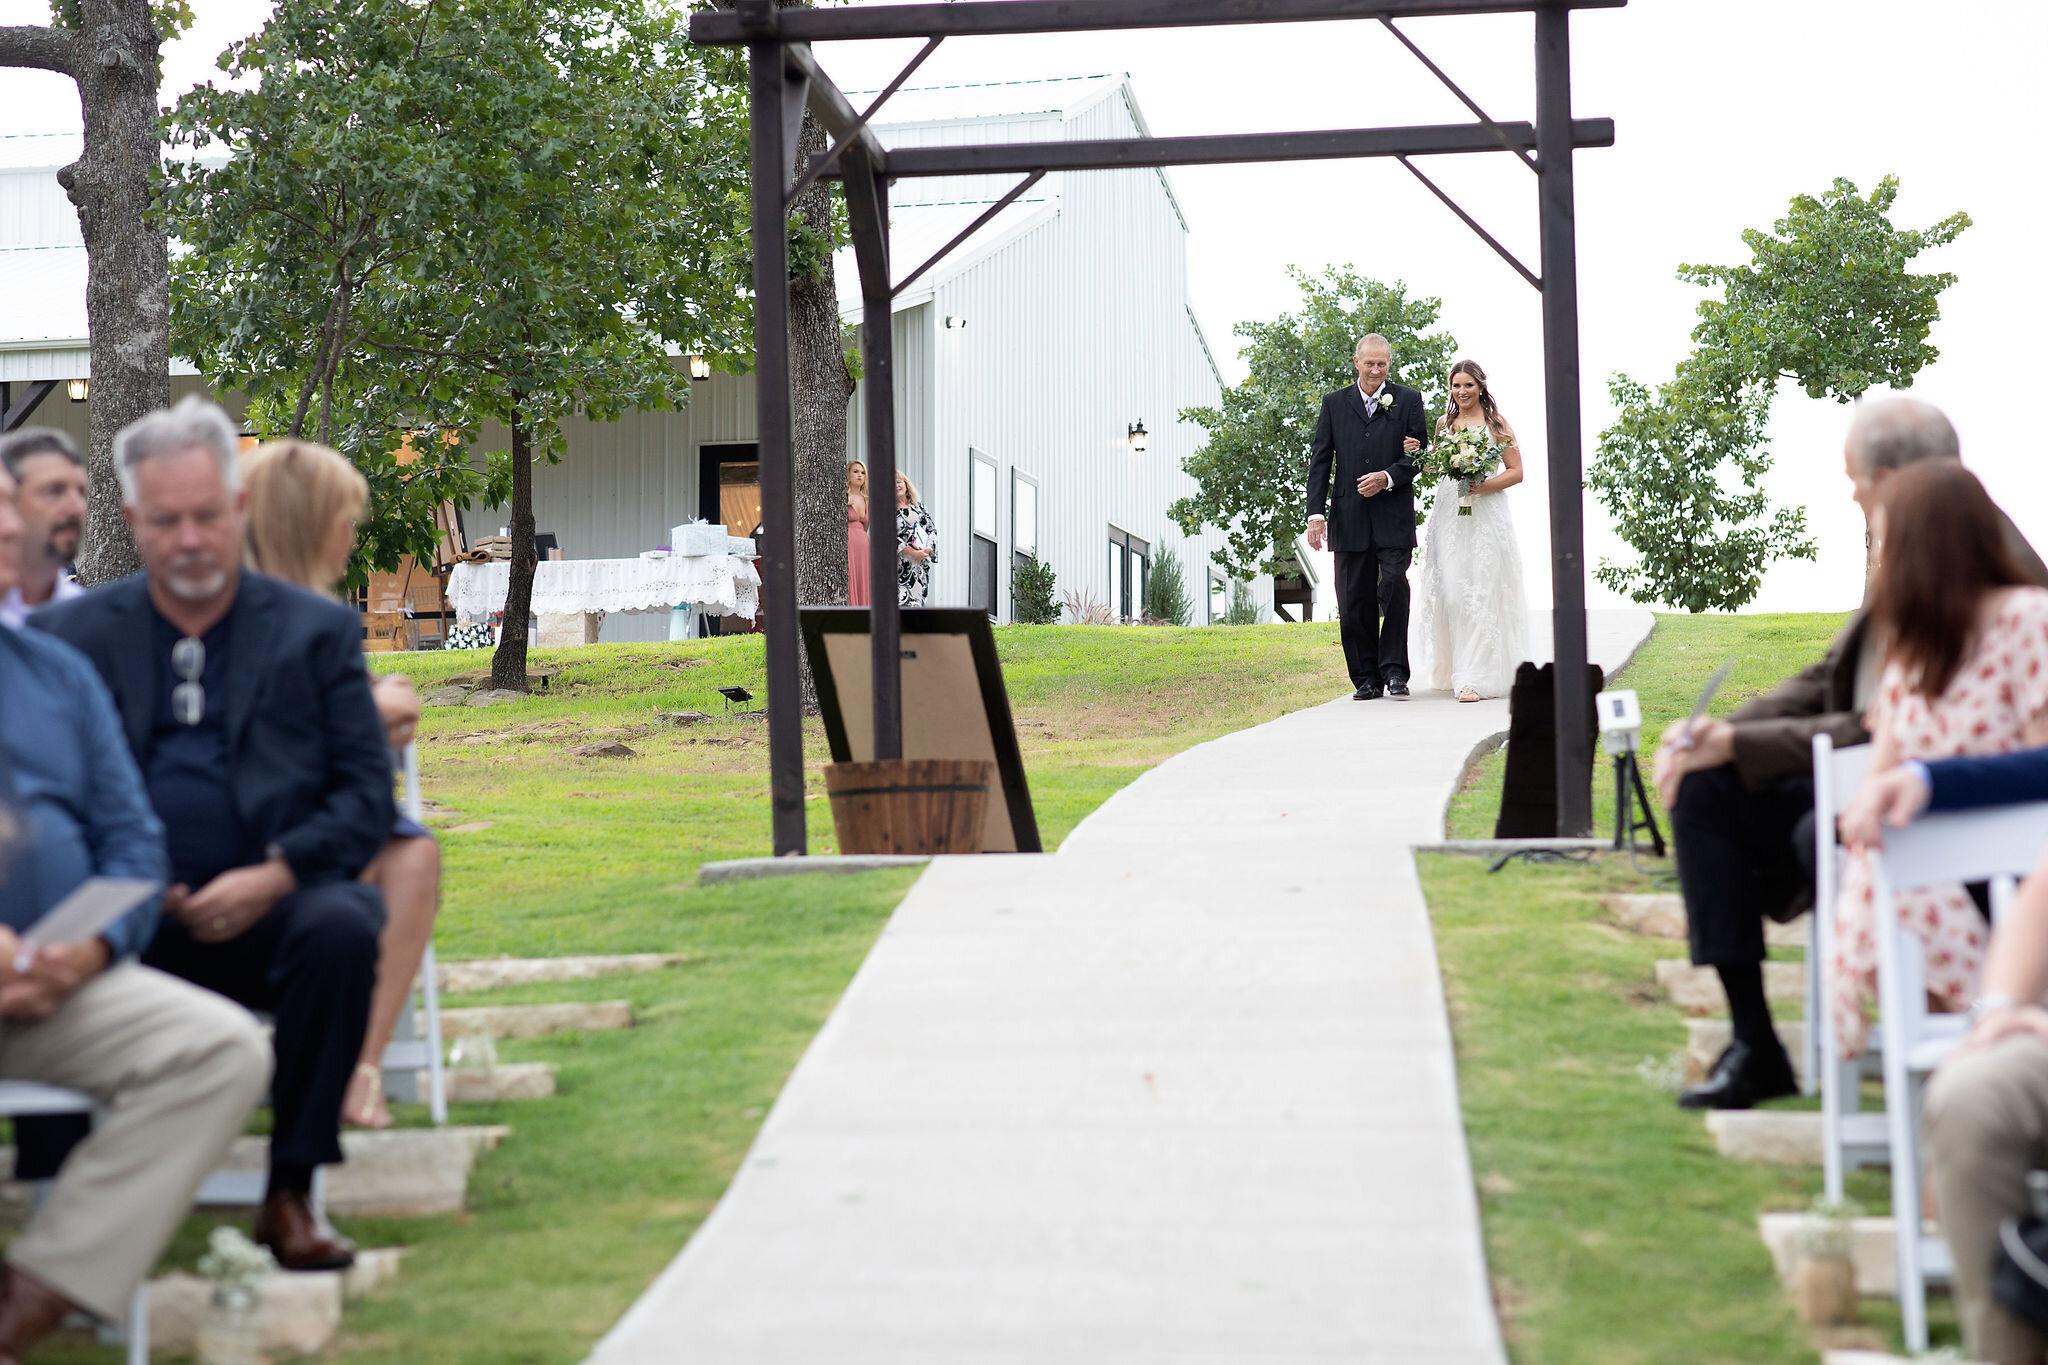 Oklahoma Summer Wedding Venue Dream Point Ranch 25.jpg